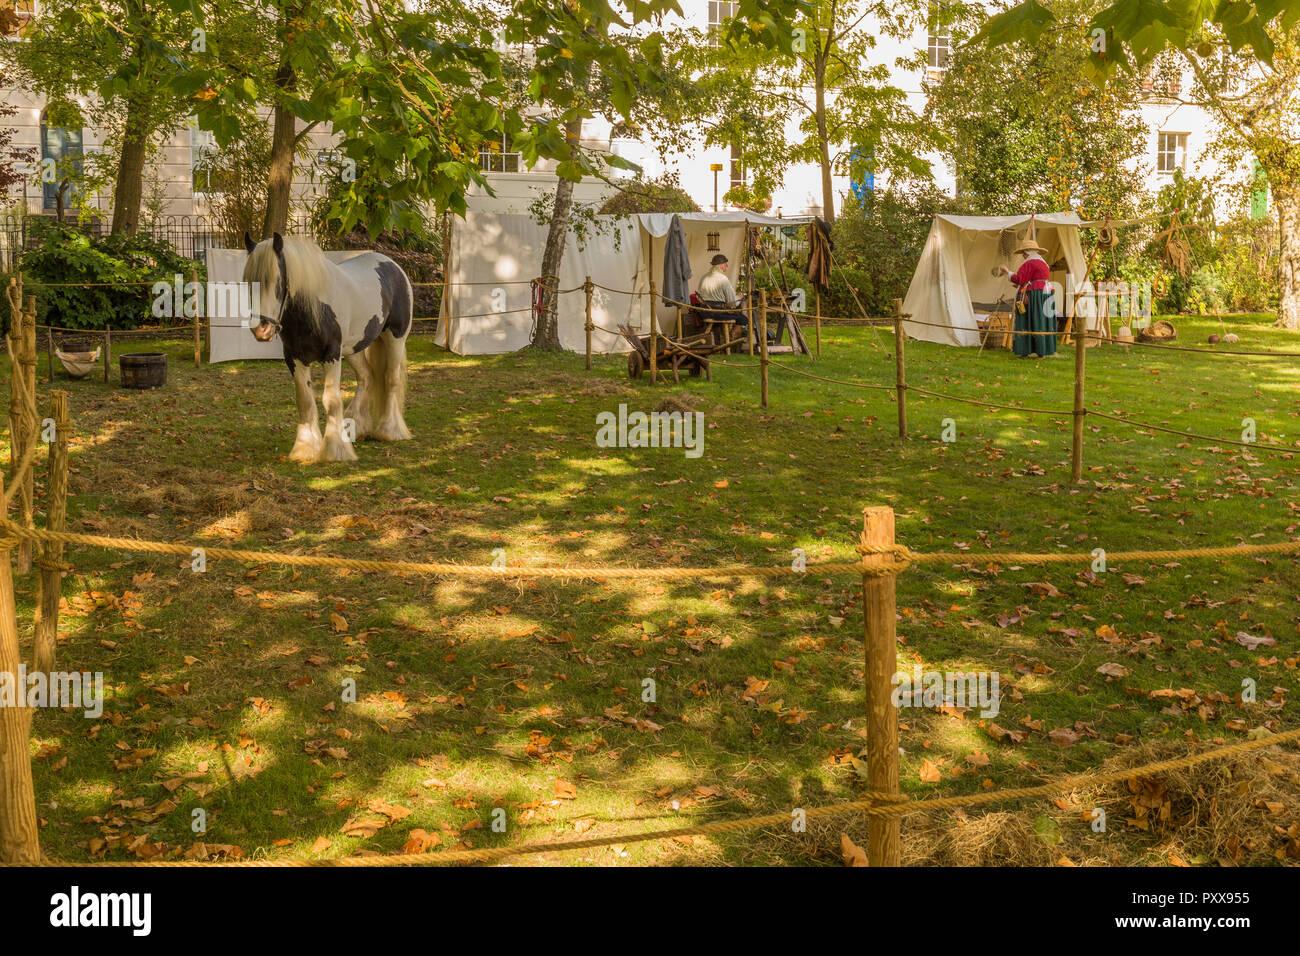 Reenactment Of English Civil War Camp Site In Brunswick Square Gloucester